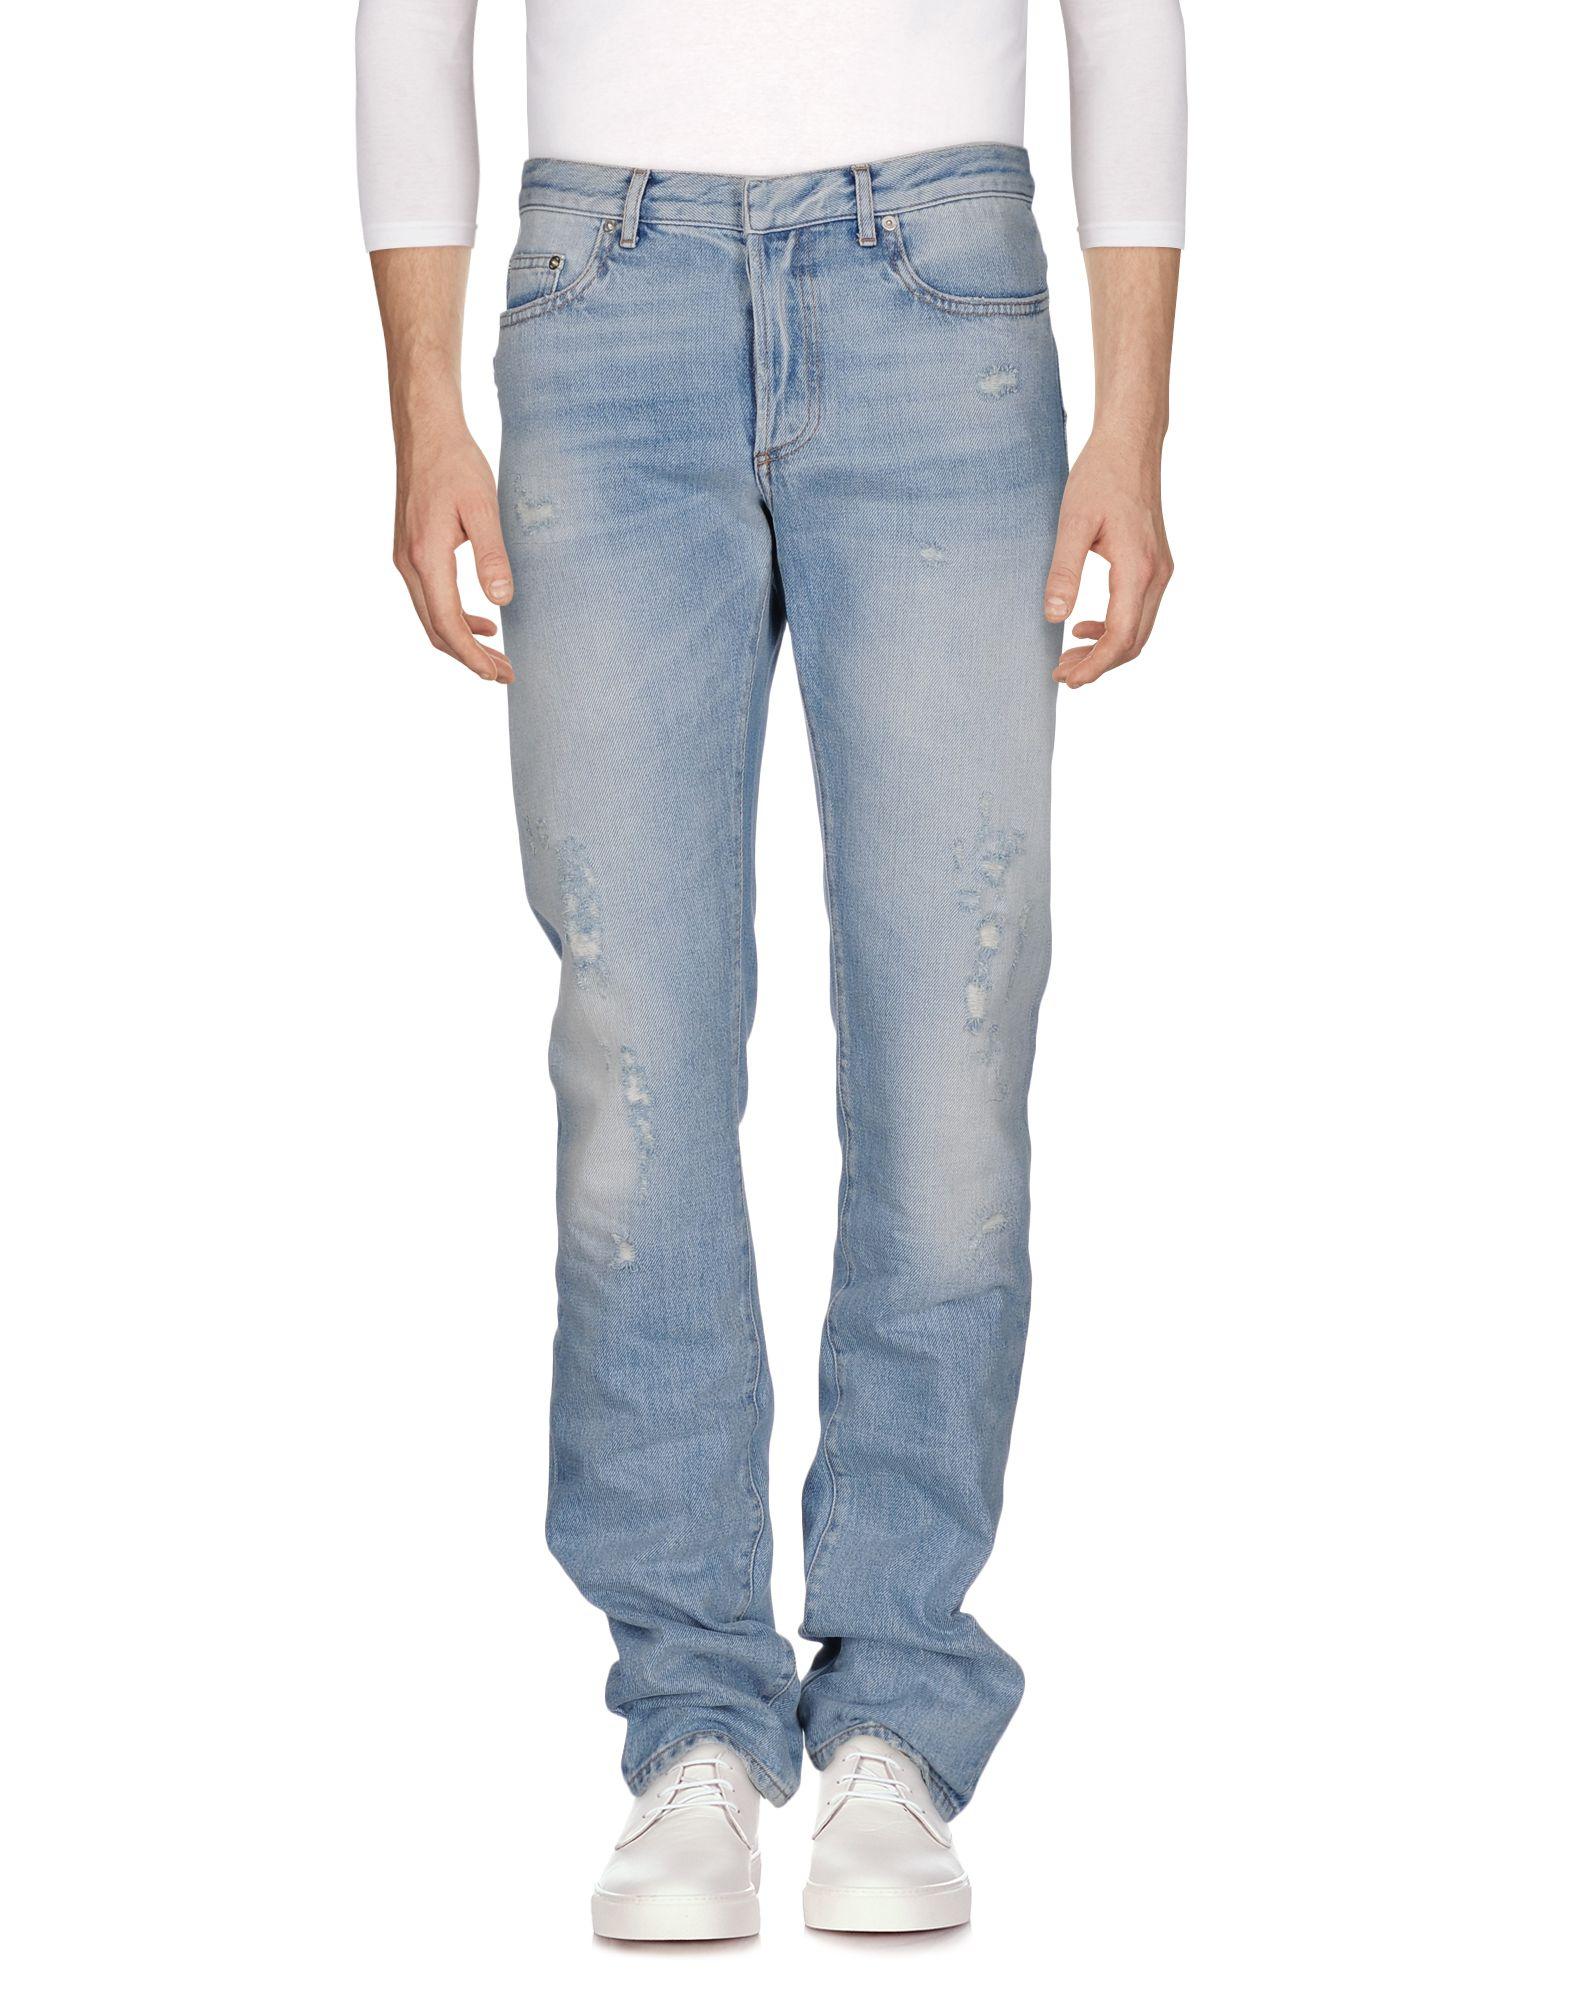 Pantaloni Jeans Dior Uomo Homme Uomo Dior - 42636863ET d3dae2